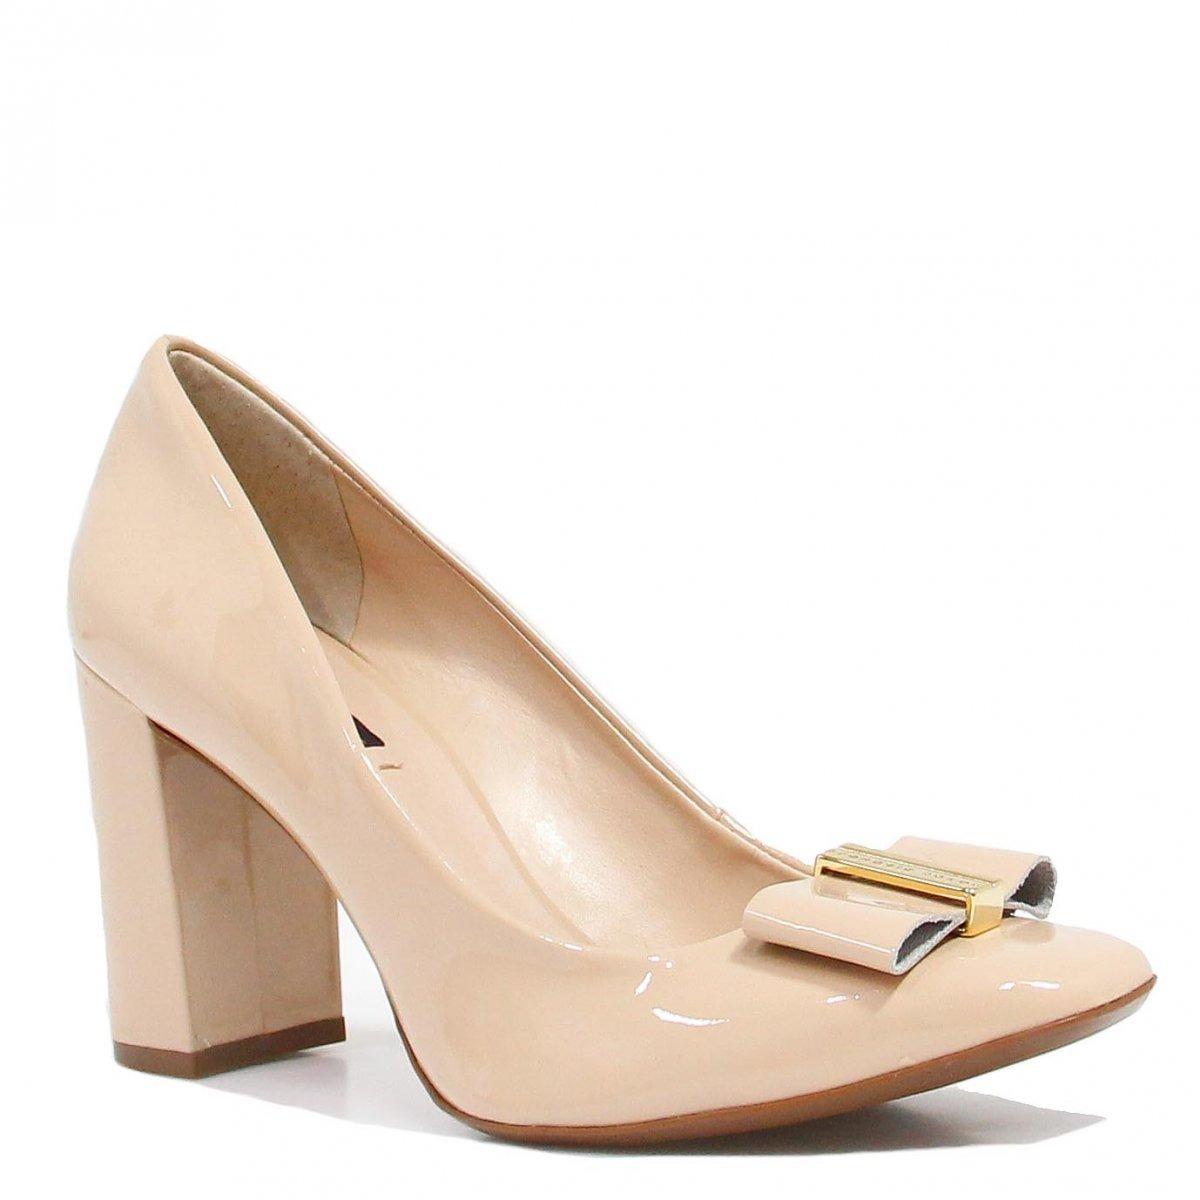 4597e24b1 Sapato Jorge Bischoff Scarpin Laço Nude